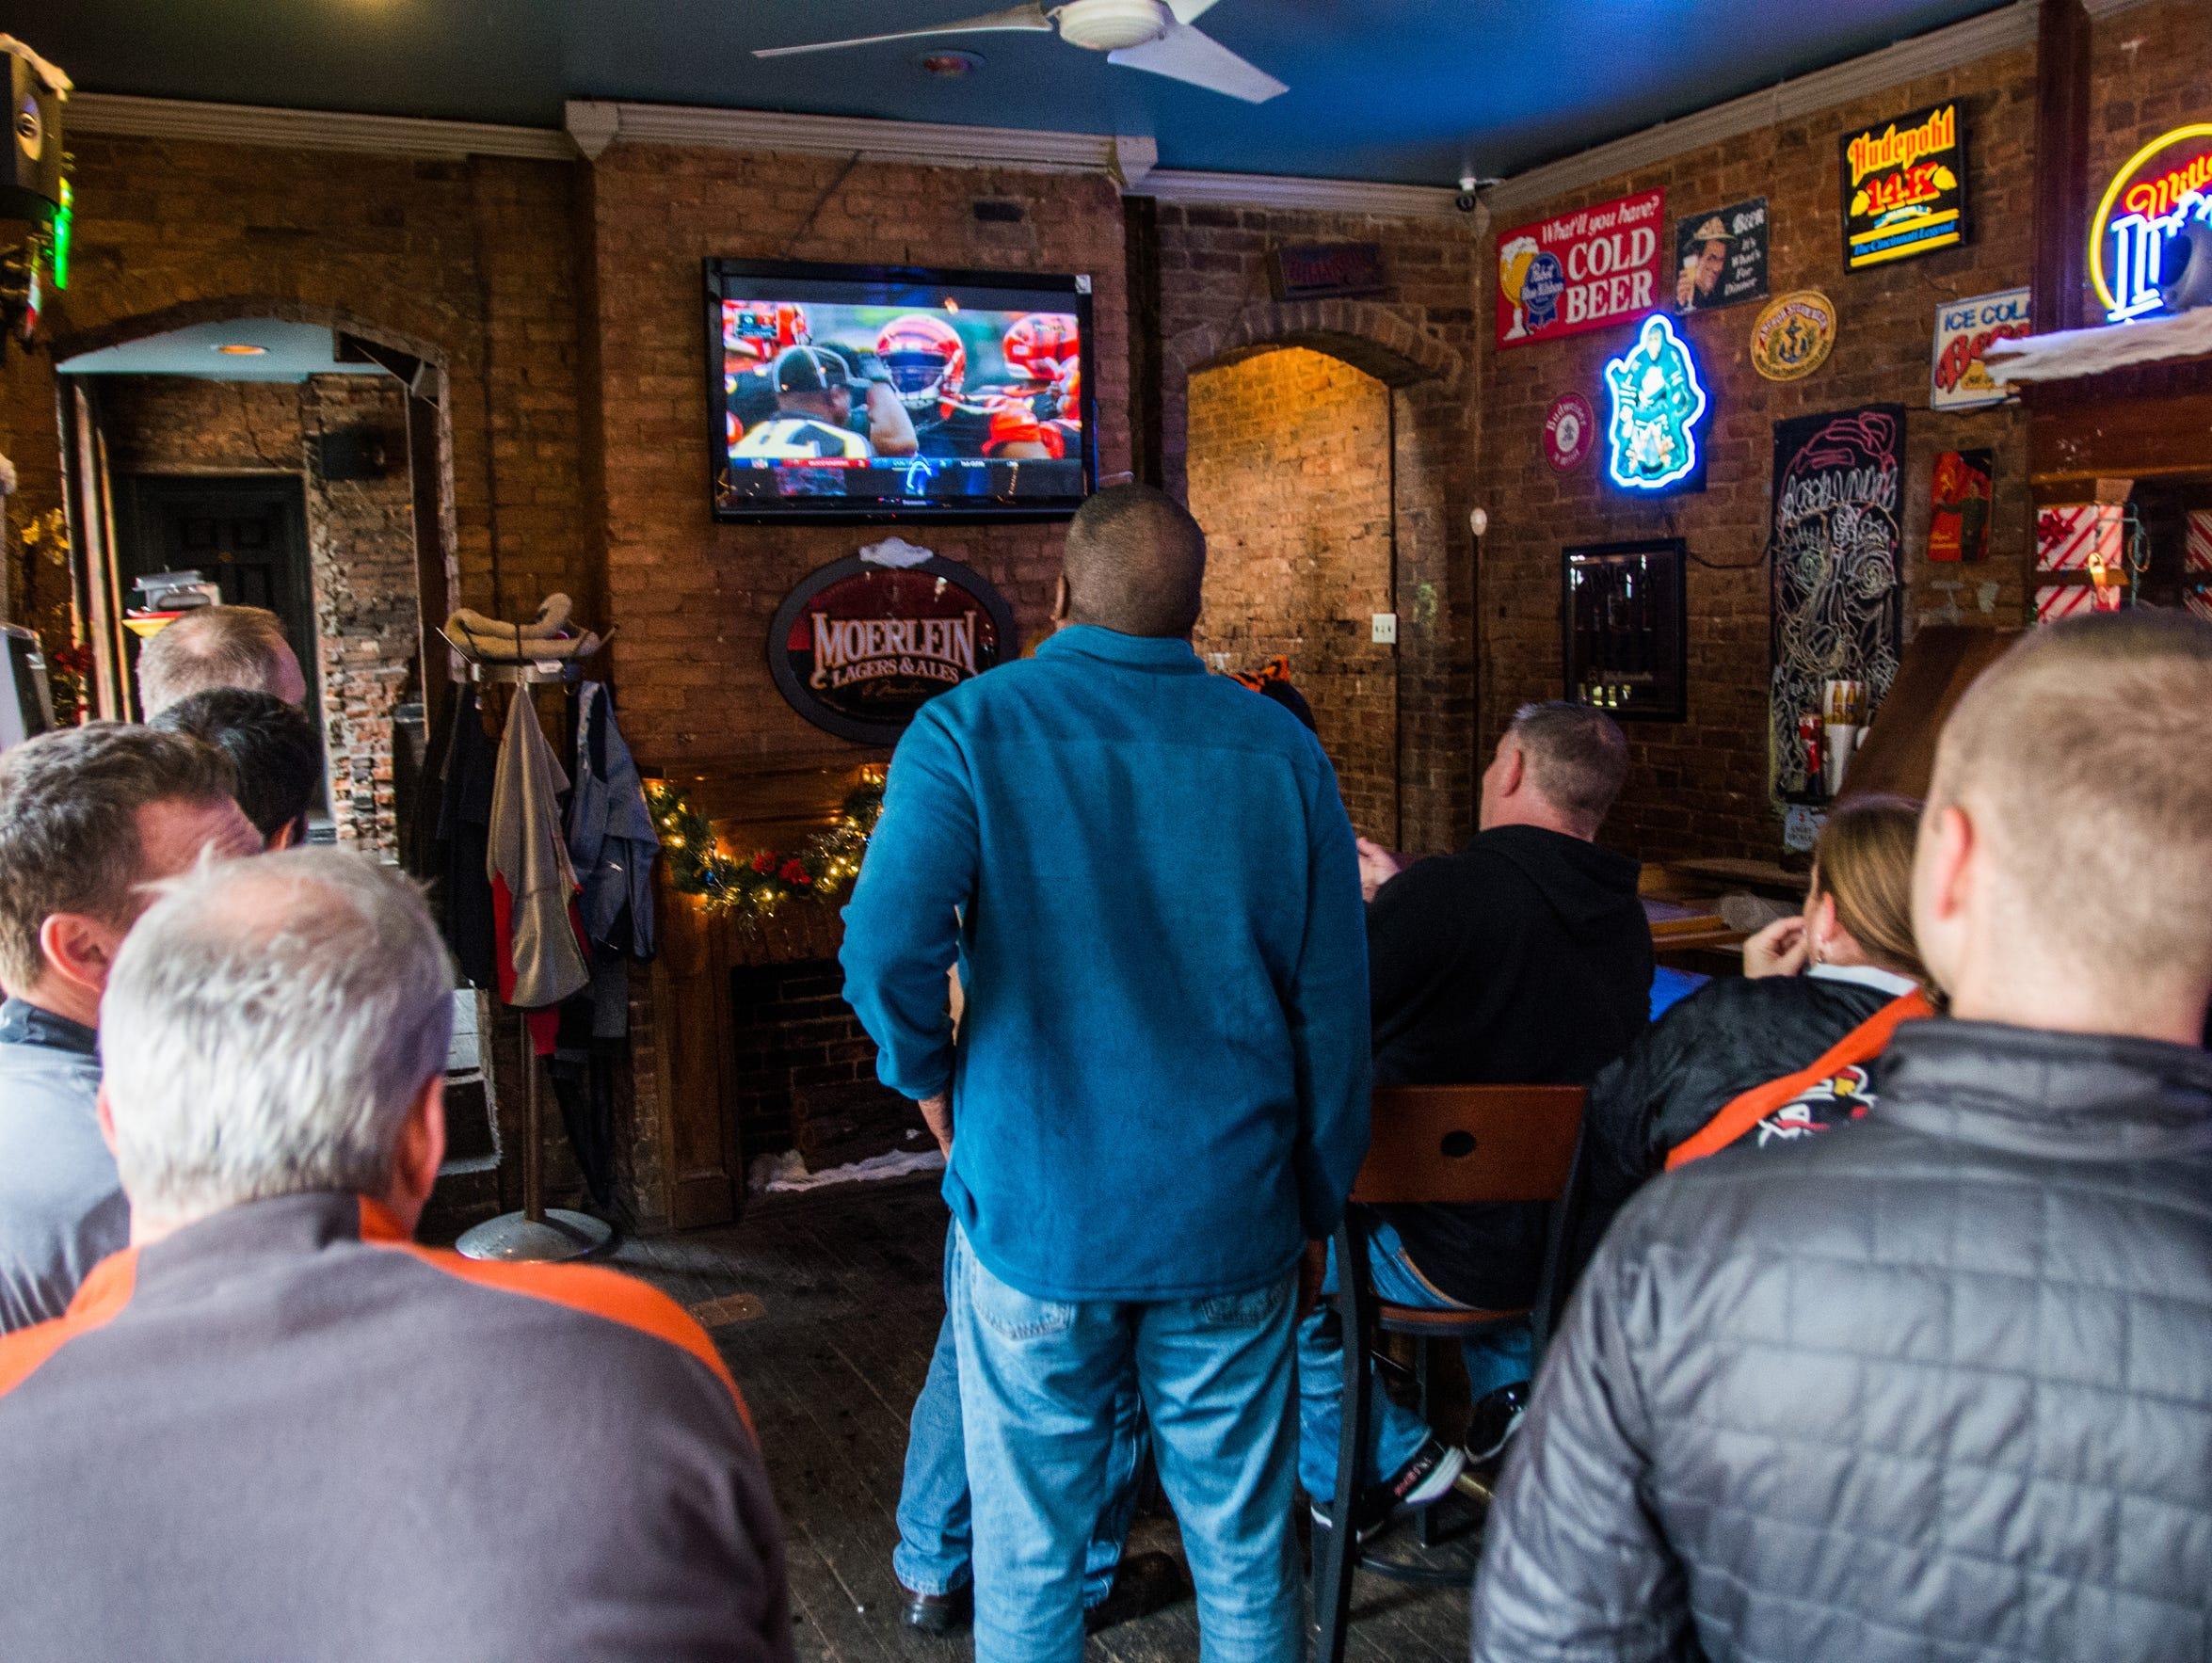 Community members gather inside Milton's Bar Nov. 29